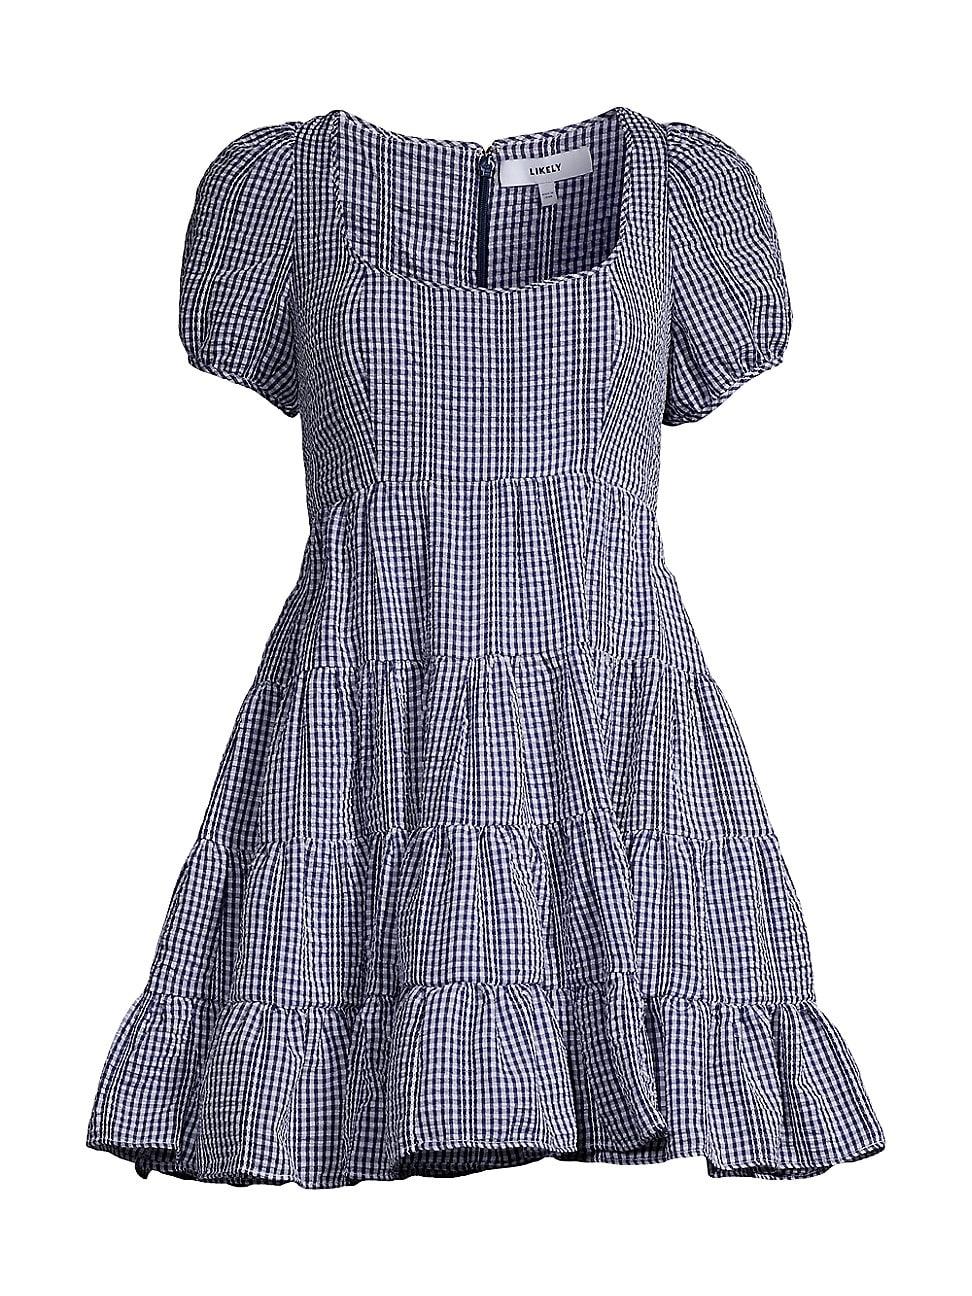 Likely WOMEN'S MINI CHLOE GINGHAM DRESS